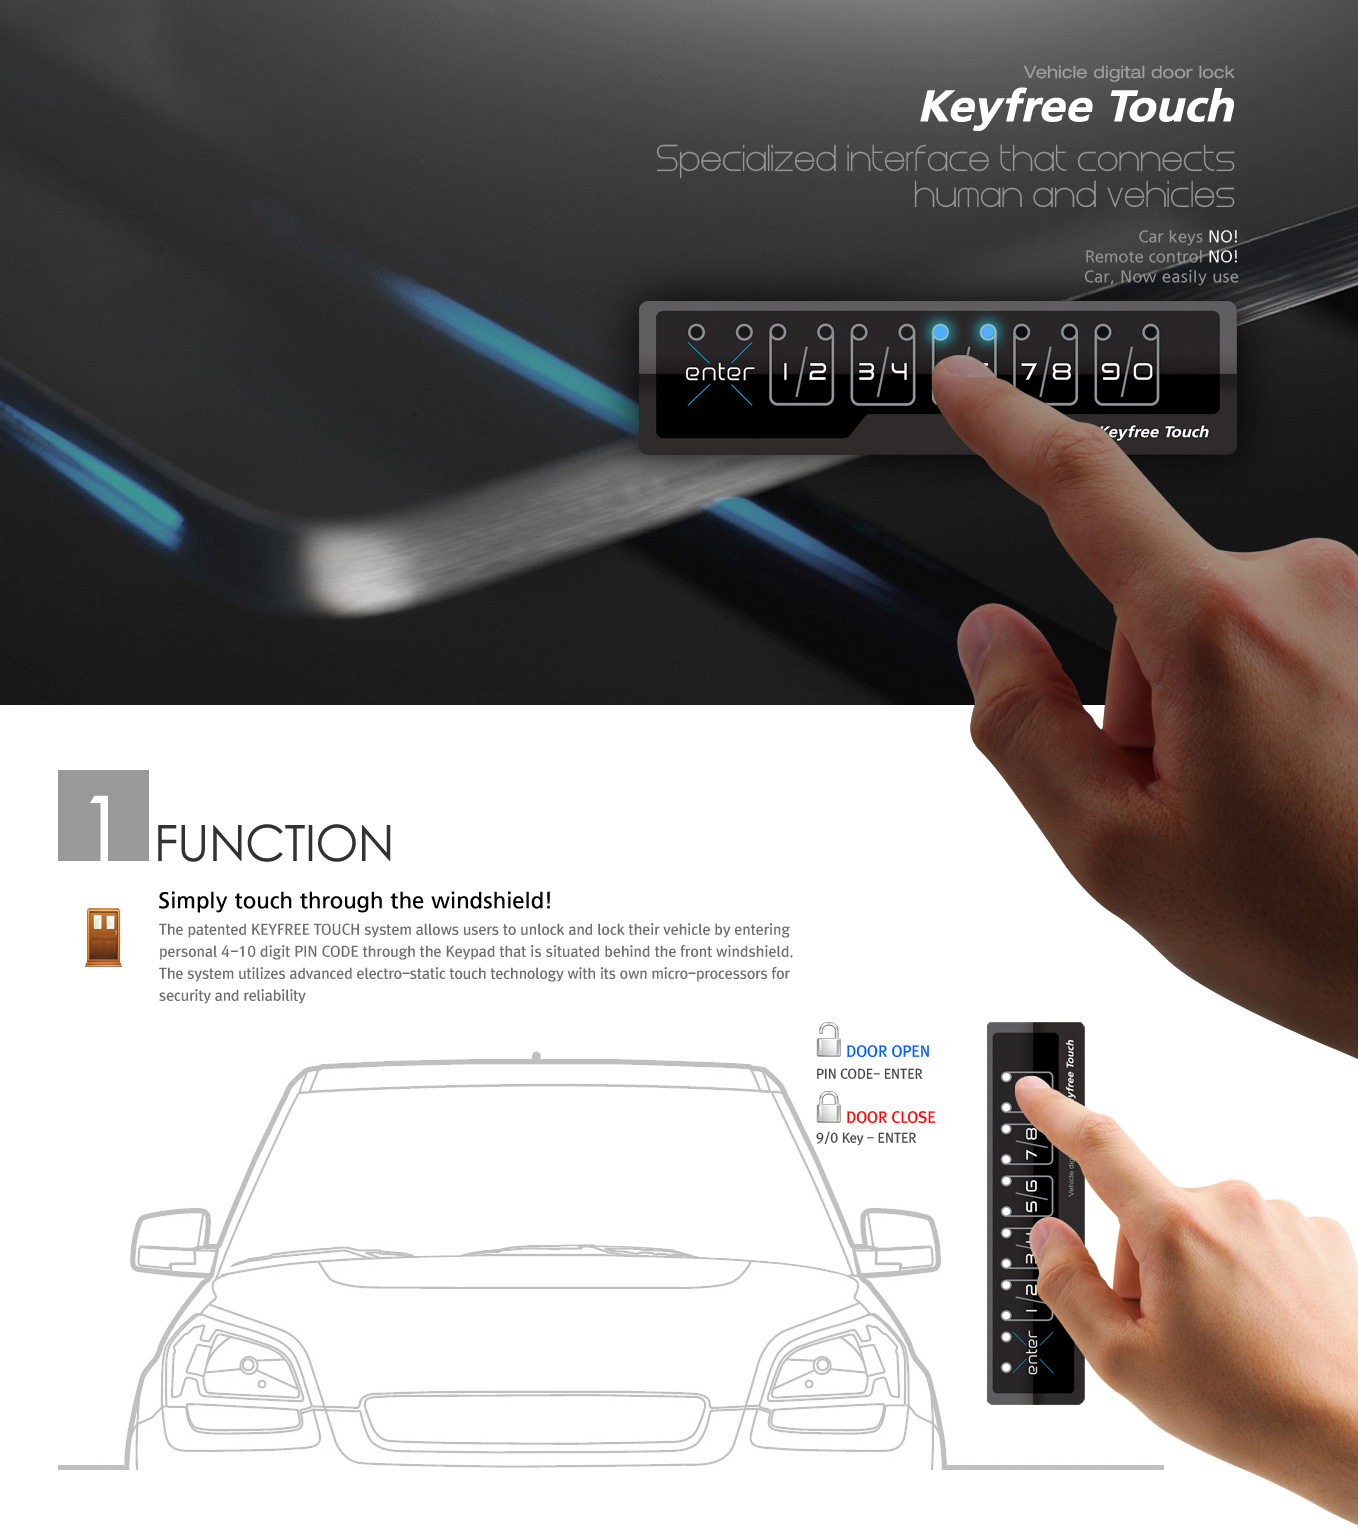 Vehicle digital door lock for the car sharing | BISRO CO , LTD